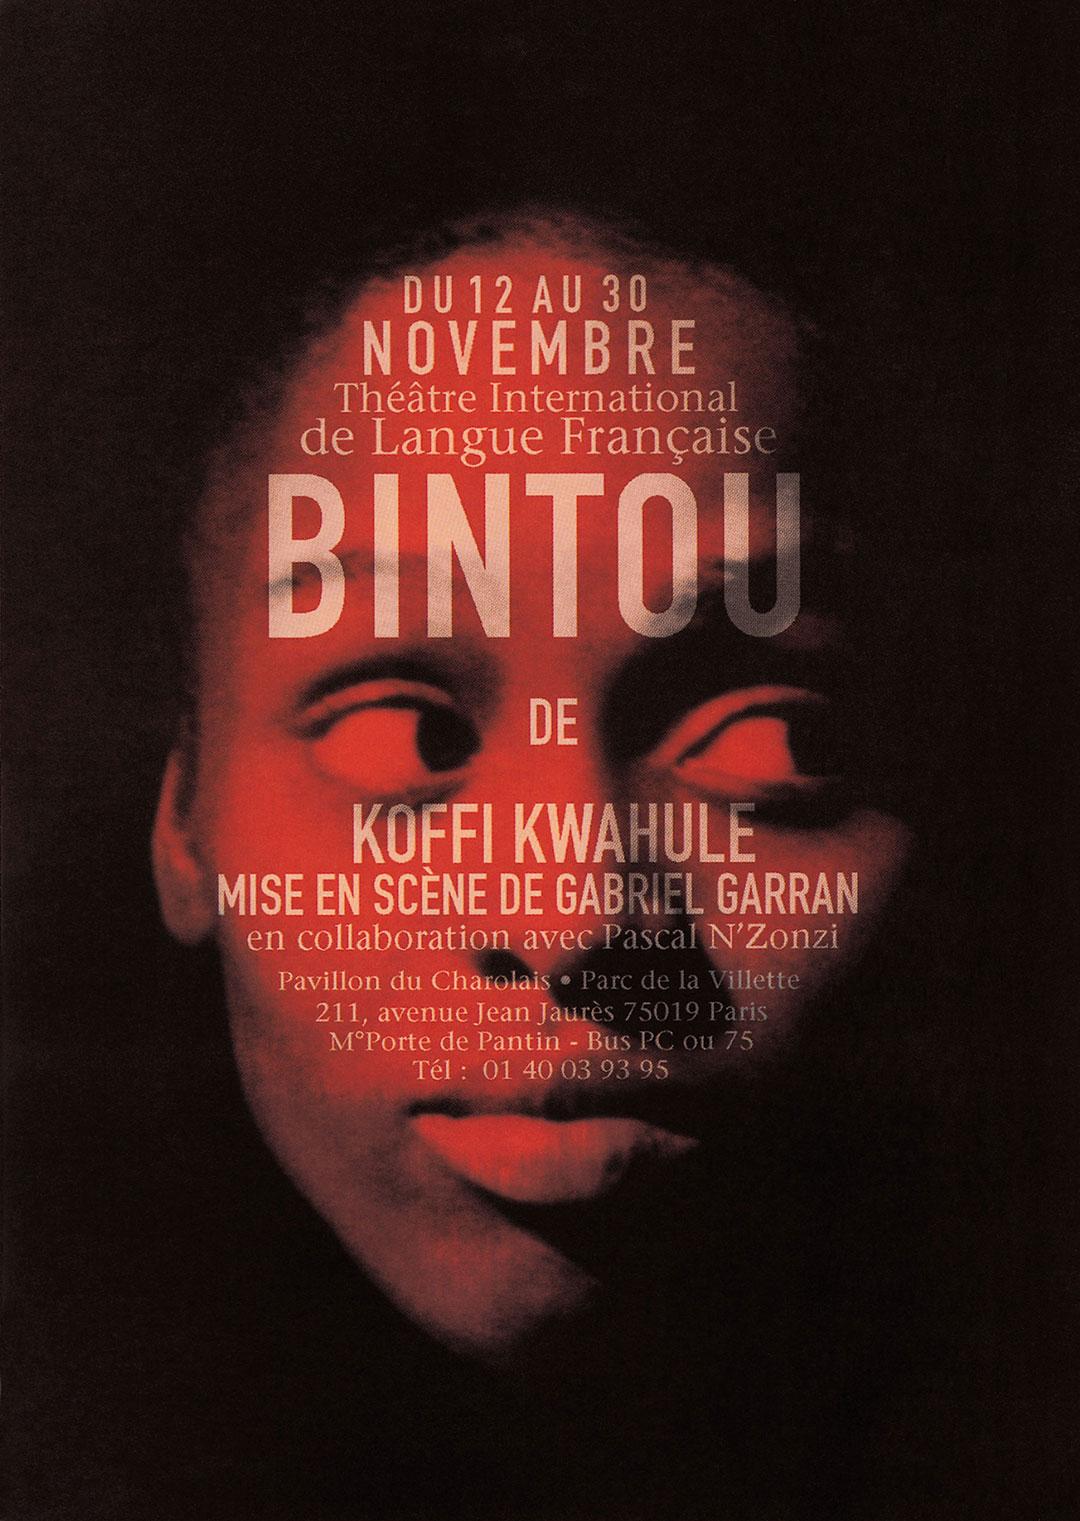 Affiche Bintou théâtre International